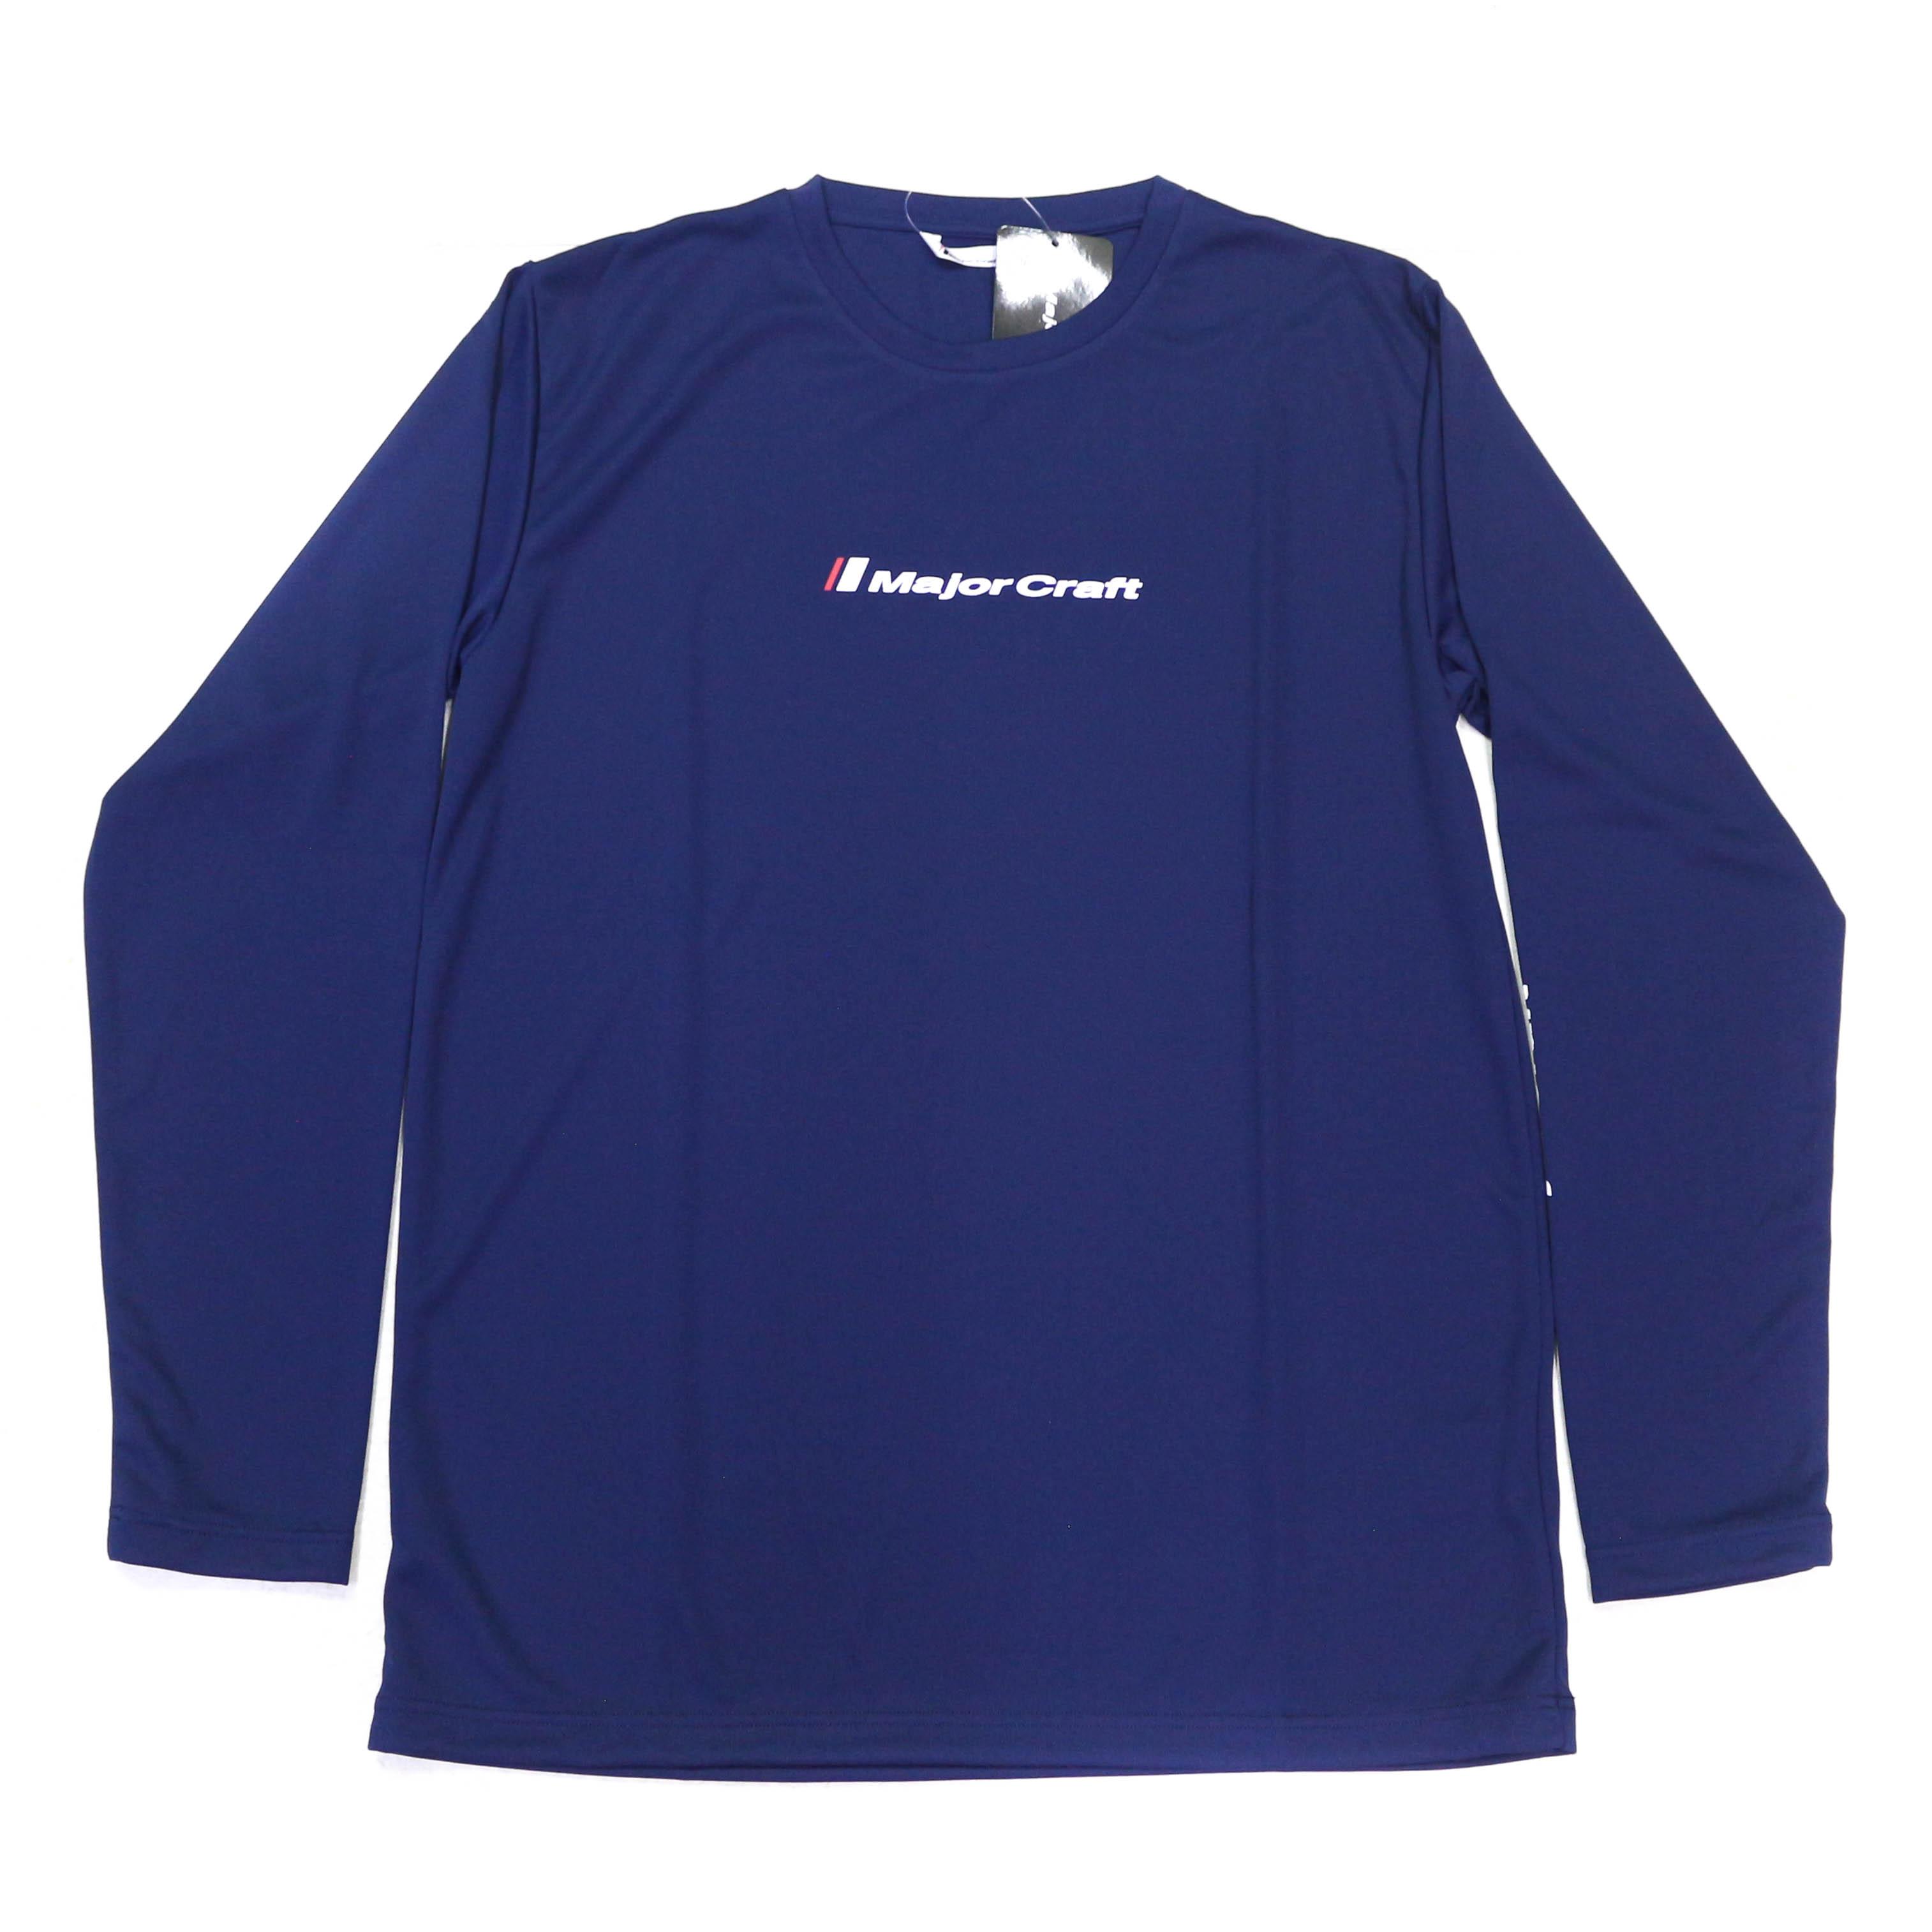 Major Craft T-Shirt Long Sleeve MCW-DLT-S/NV (3024)